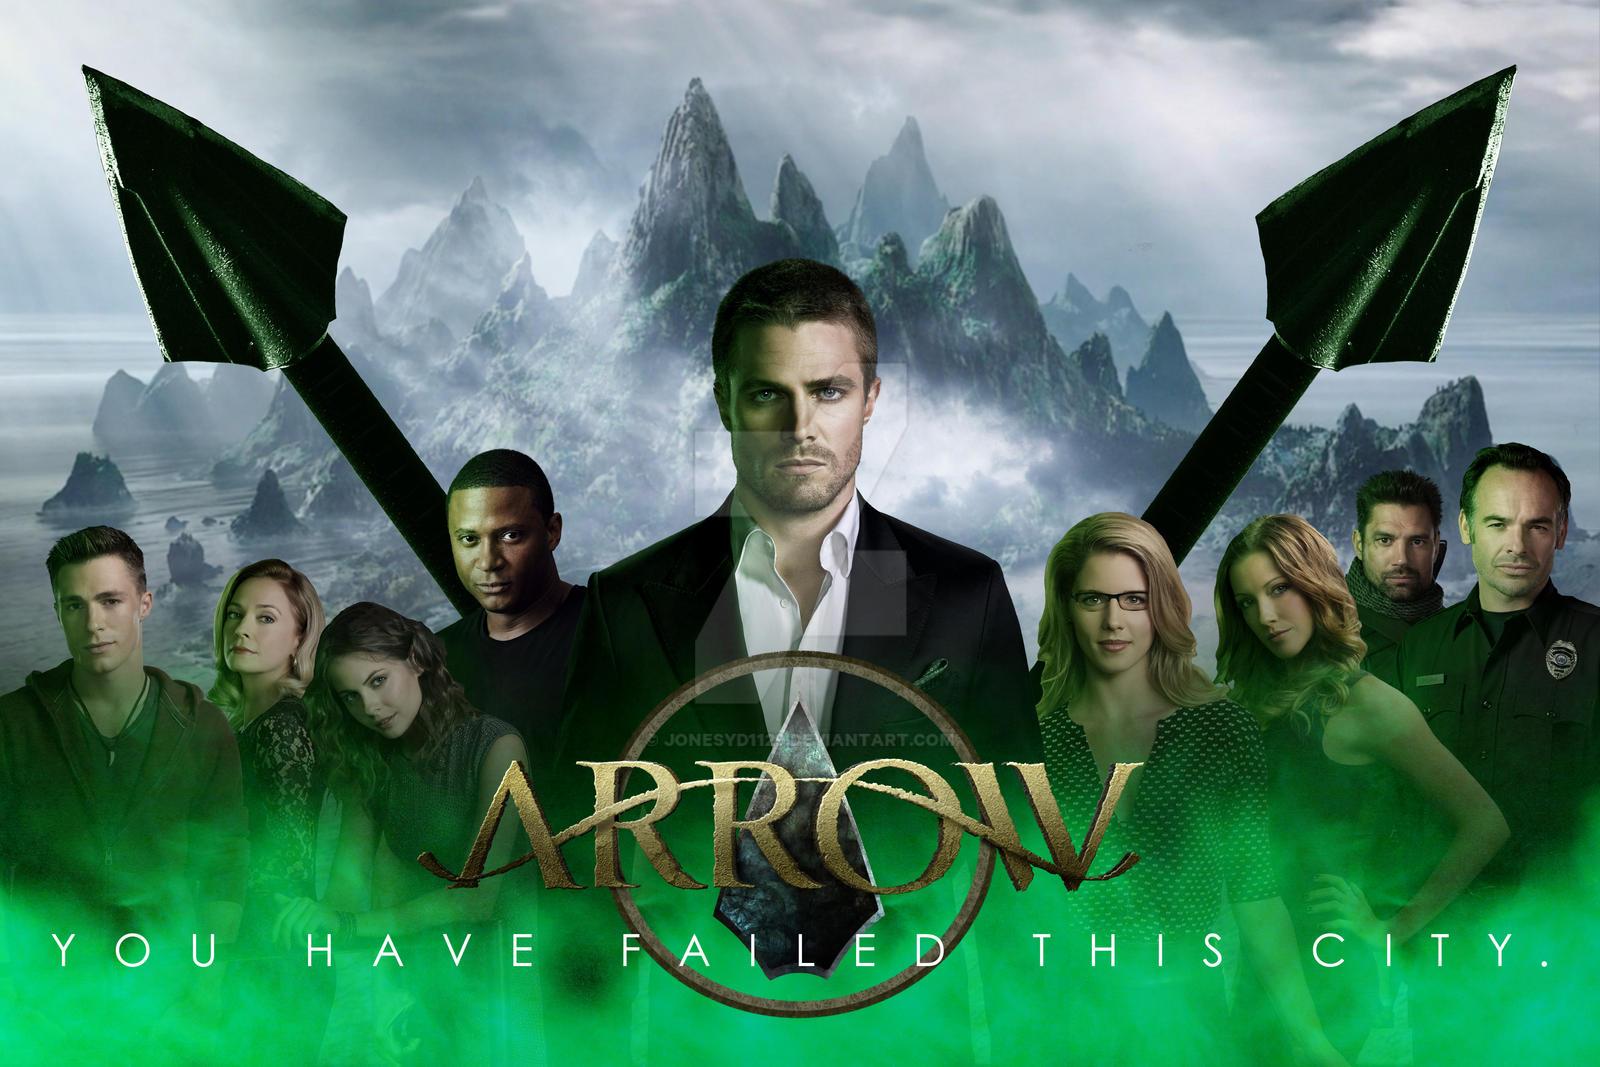 Good Wallpaper Movie Arrow - arrow_season_2_cast_poster_by_jonesyd1129-d7ajyyg  Trends_37133.jpg